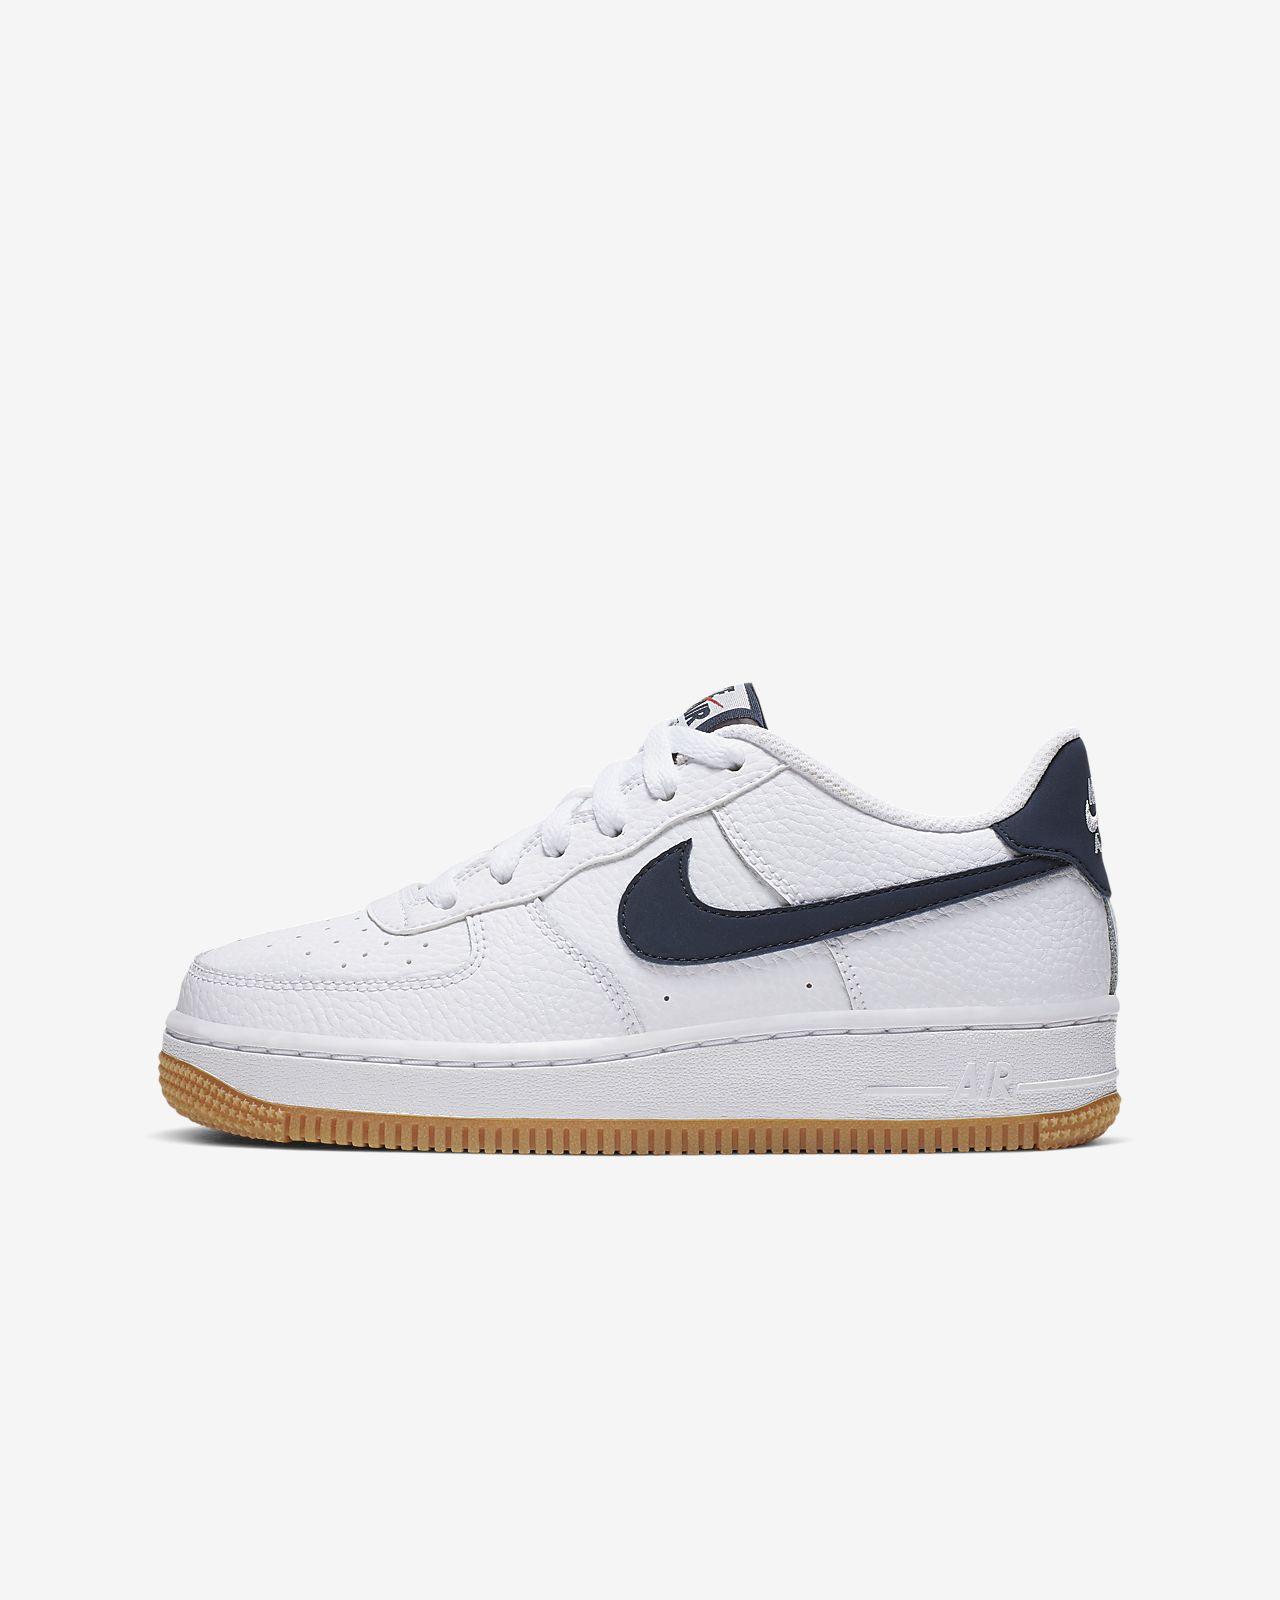 Nike Air Force 1 2 Schuh für ältere Kinder